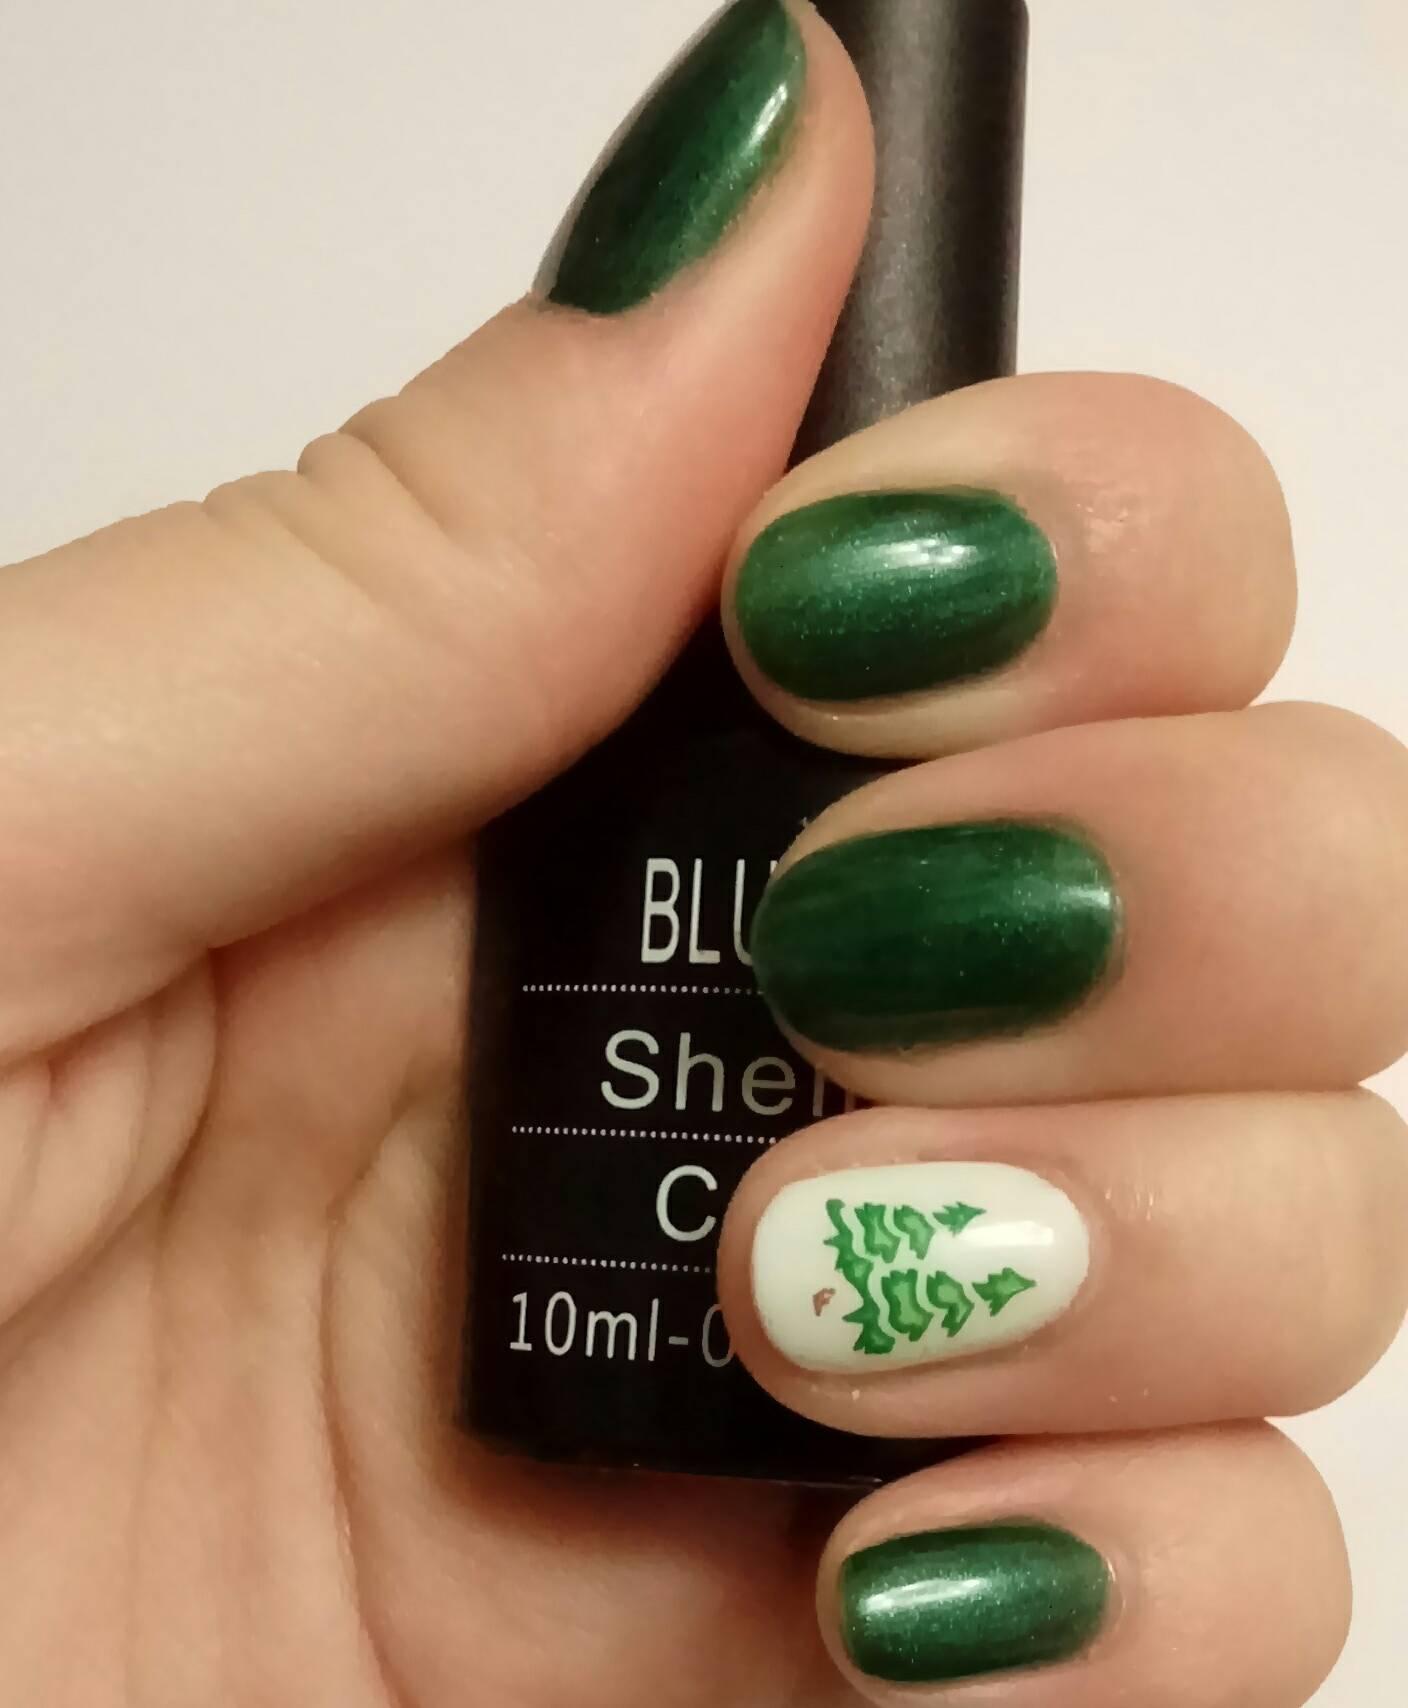 Зеленый shellac-маникюр